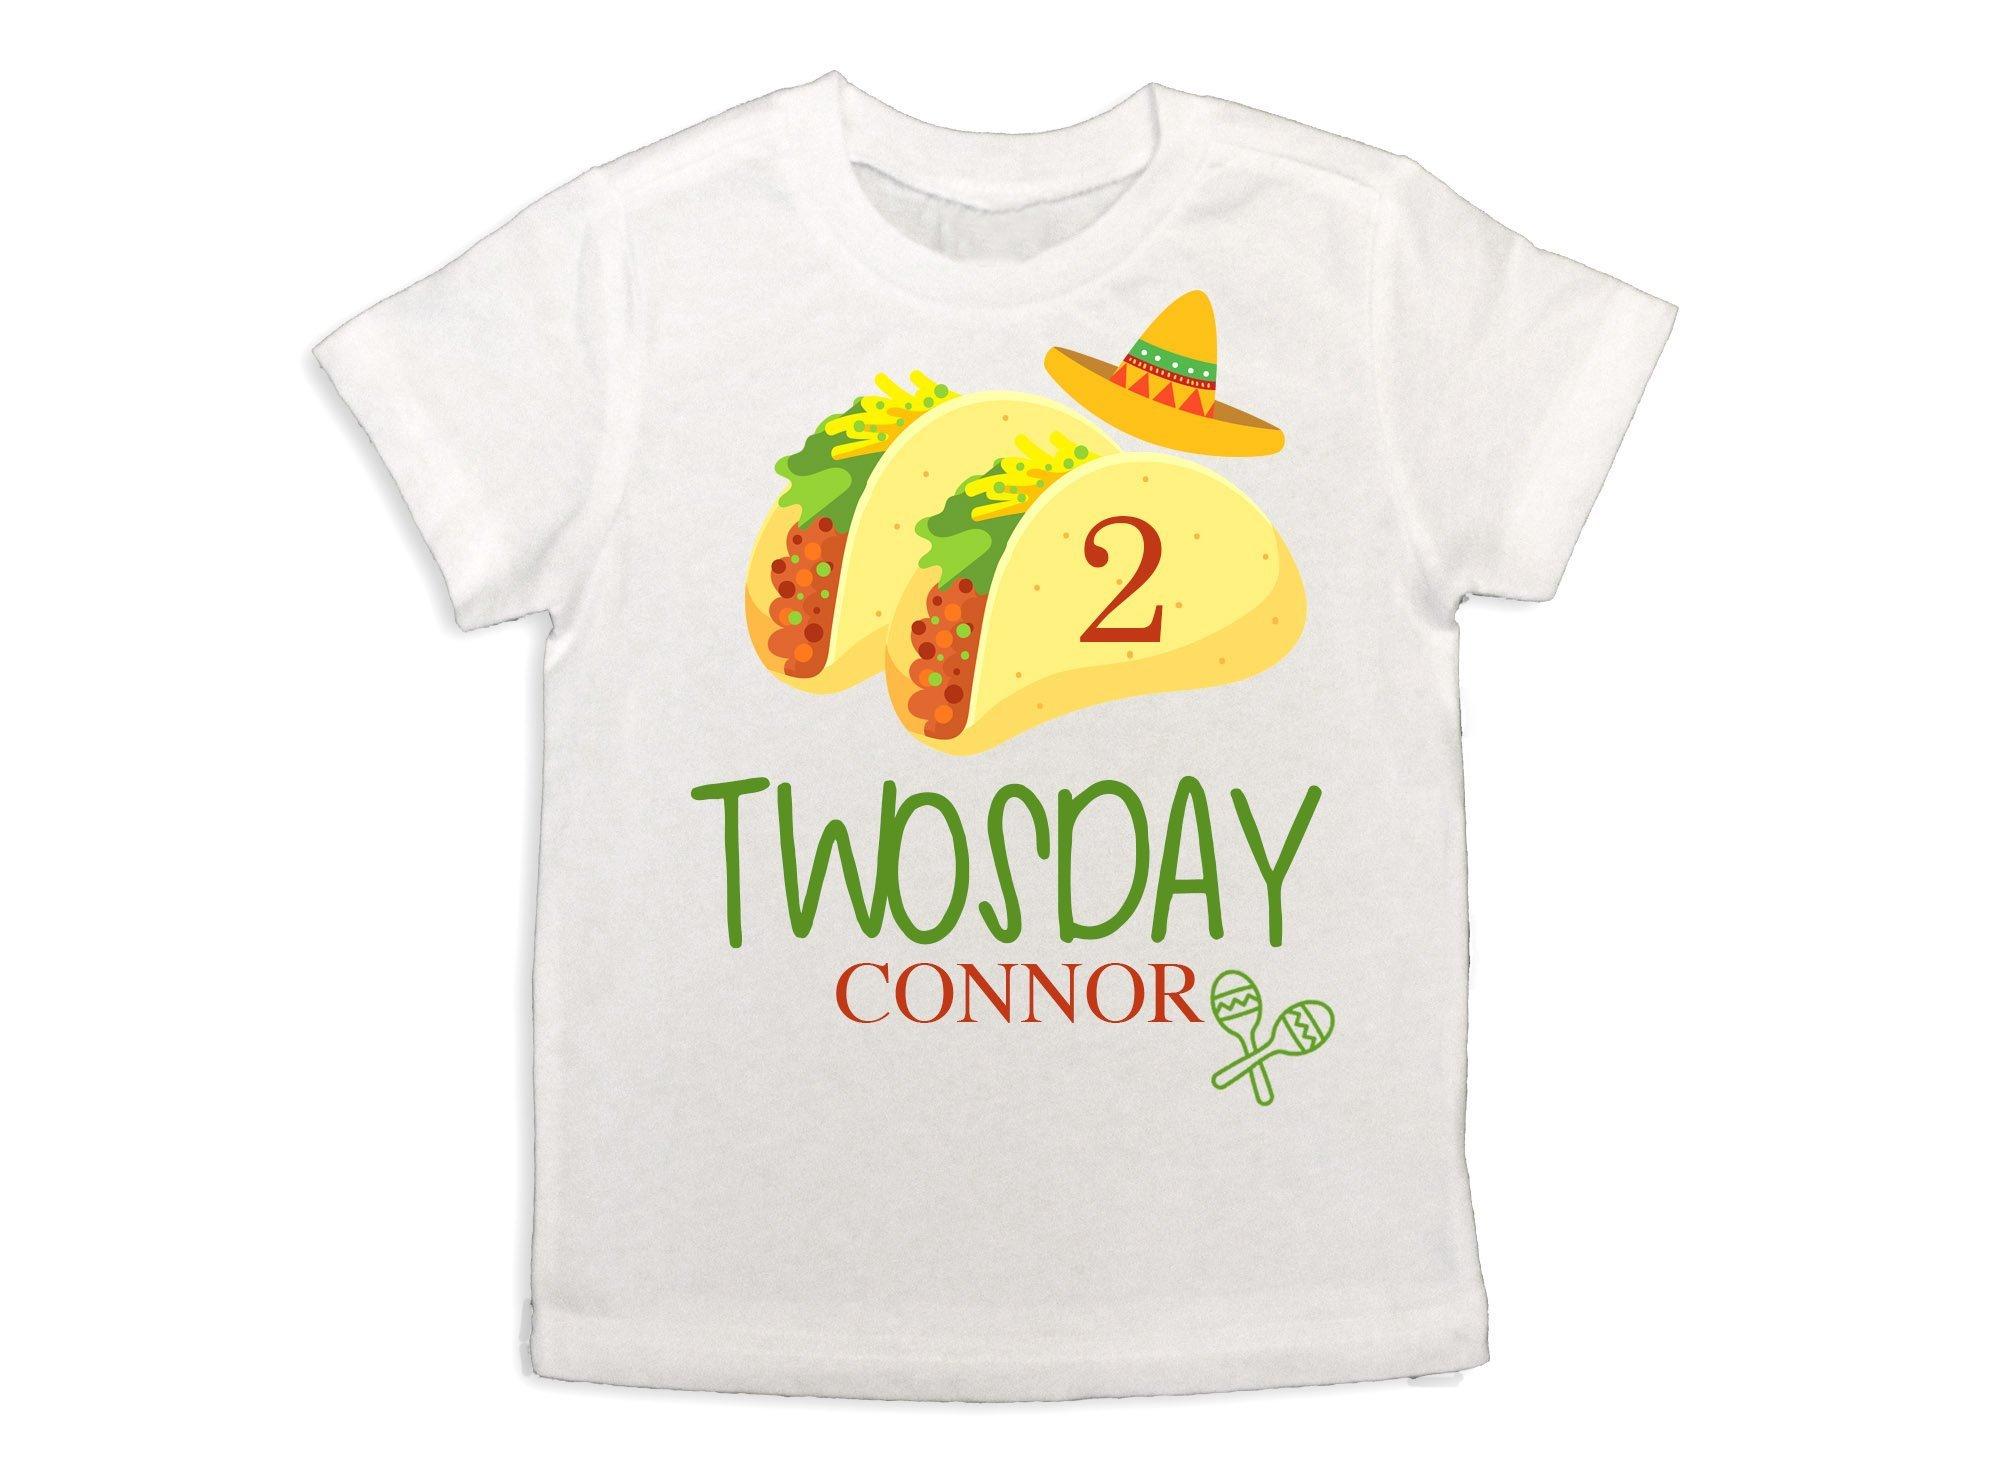 Boy's Taco Twosday Shirt Taco Shirt Baby Boy Fiesta 2nd Birthday Shirt Boys 2nd Birthday Shirt Boys Sombrero Shirt Taco 2nd Birthday Party